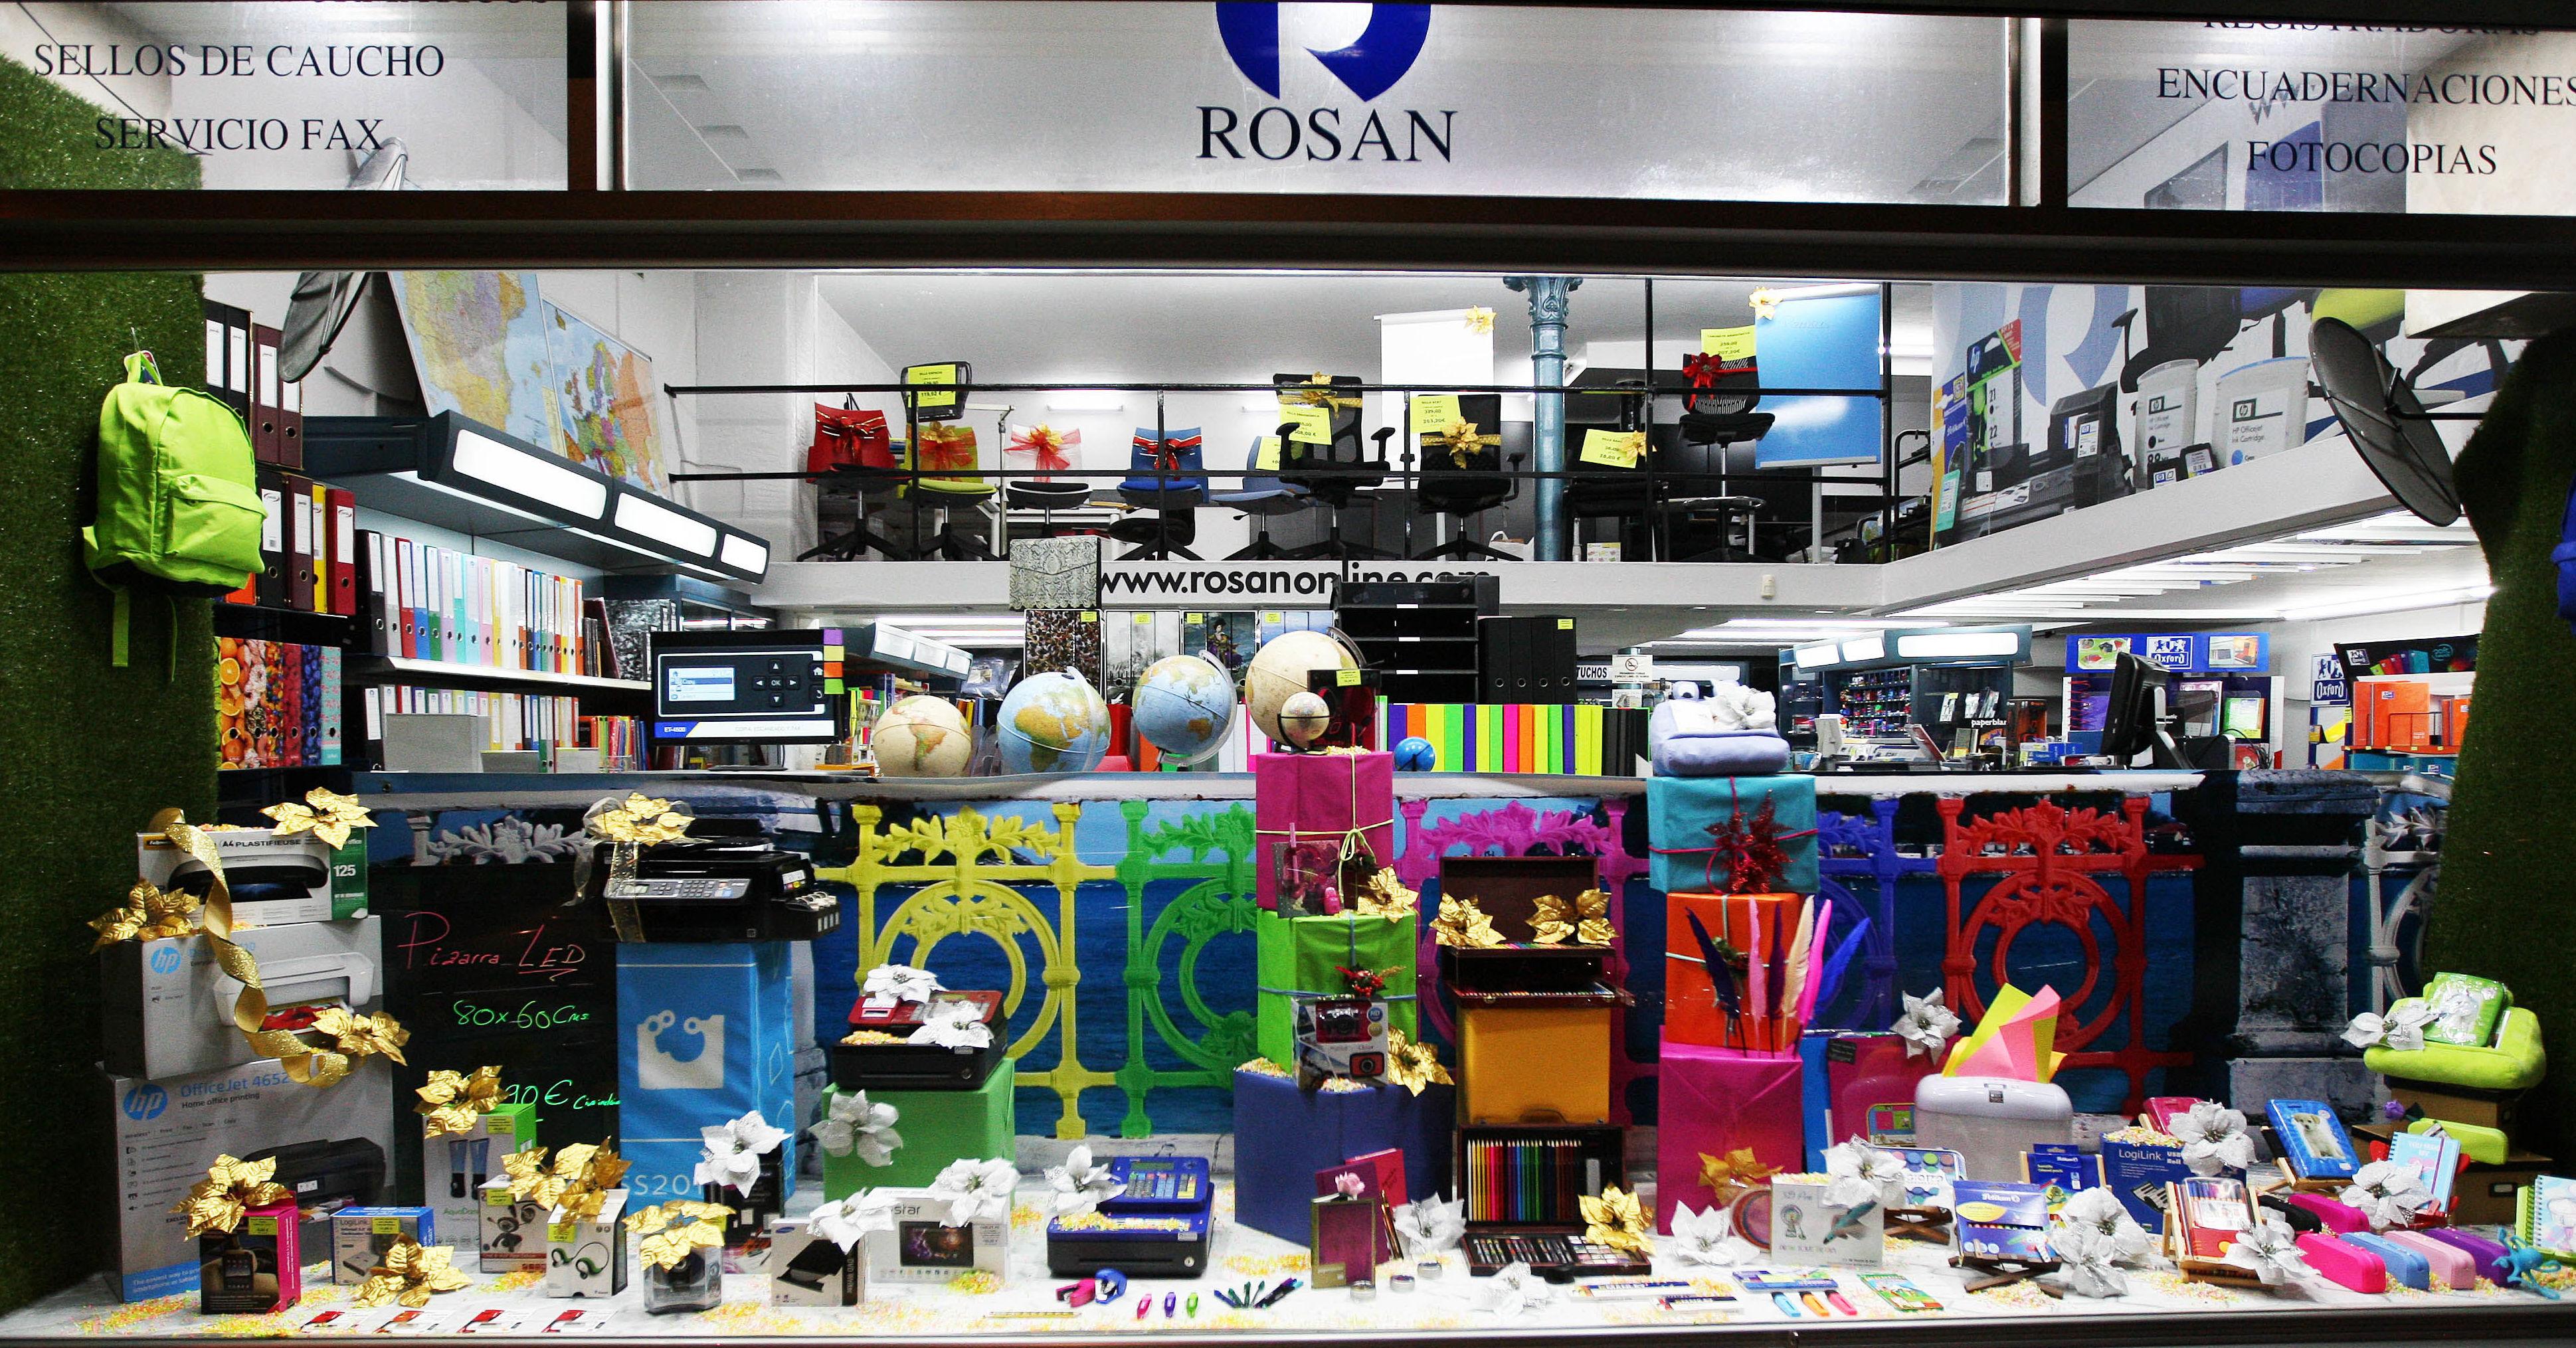 Foto 3 de Ofimática en Donostia-San Sebastián | Rosan